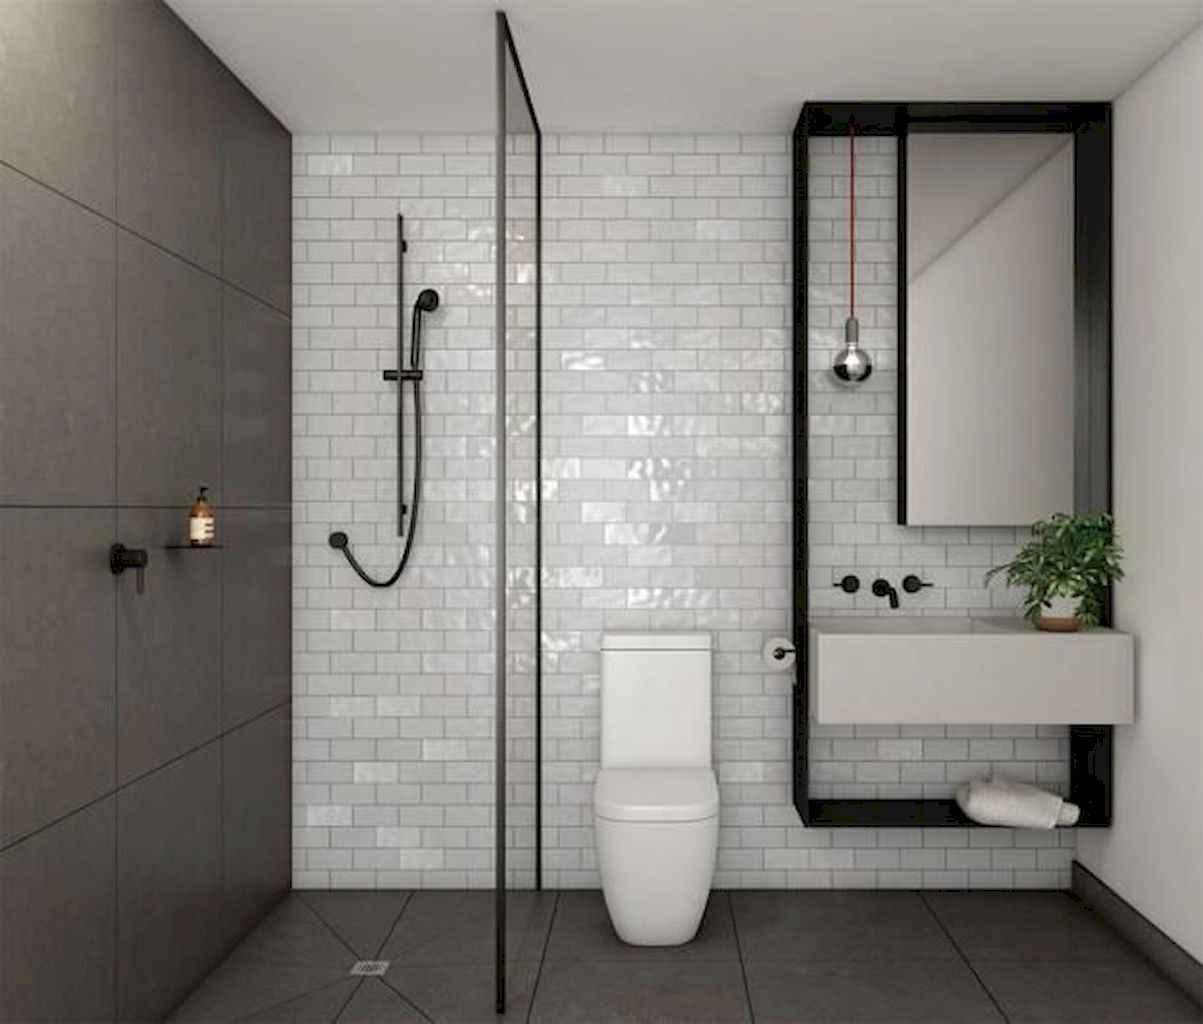 111 Brilliant Small Bathroom Remodel Ideas On A Budget (65)